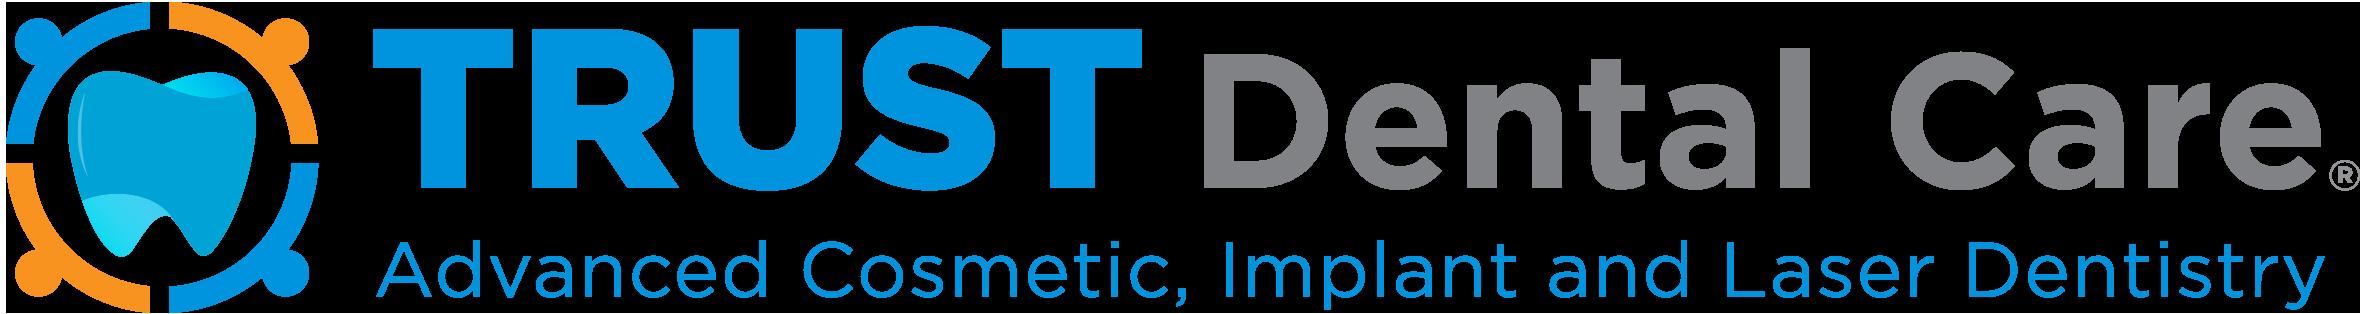 trustdentalcare Logo